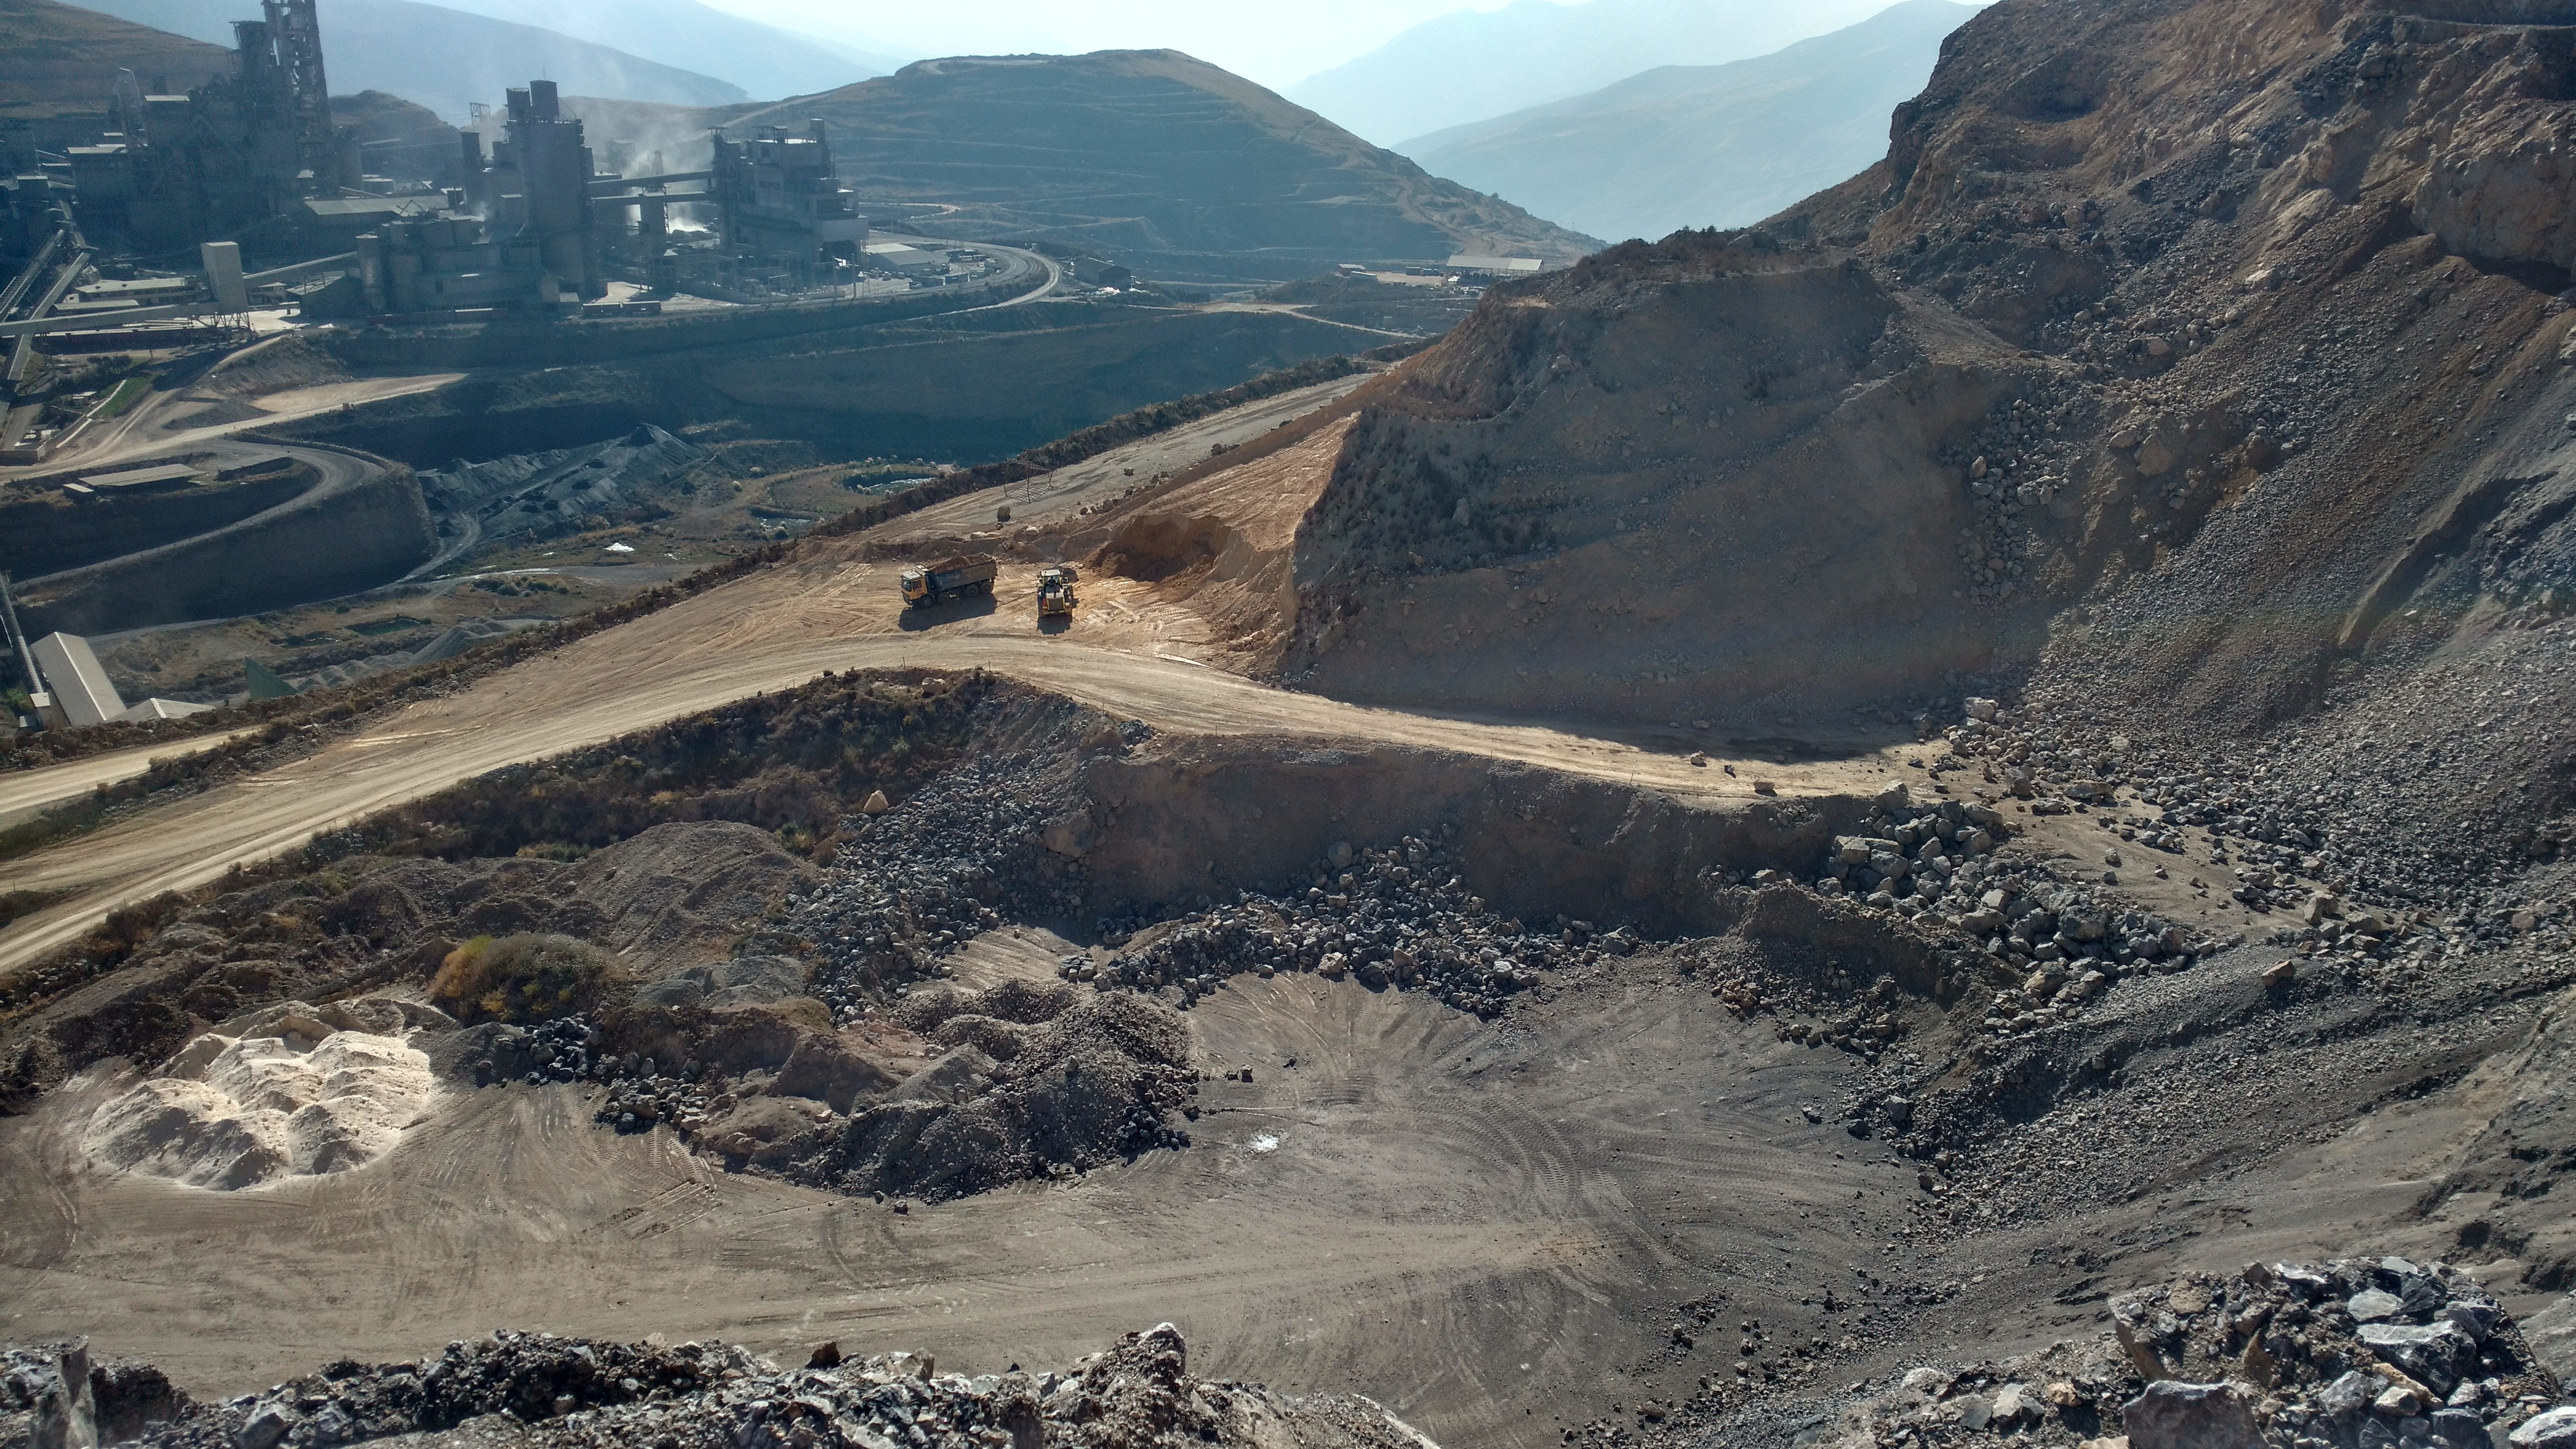 Cantera Cerro de Palo